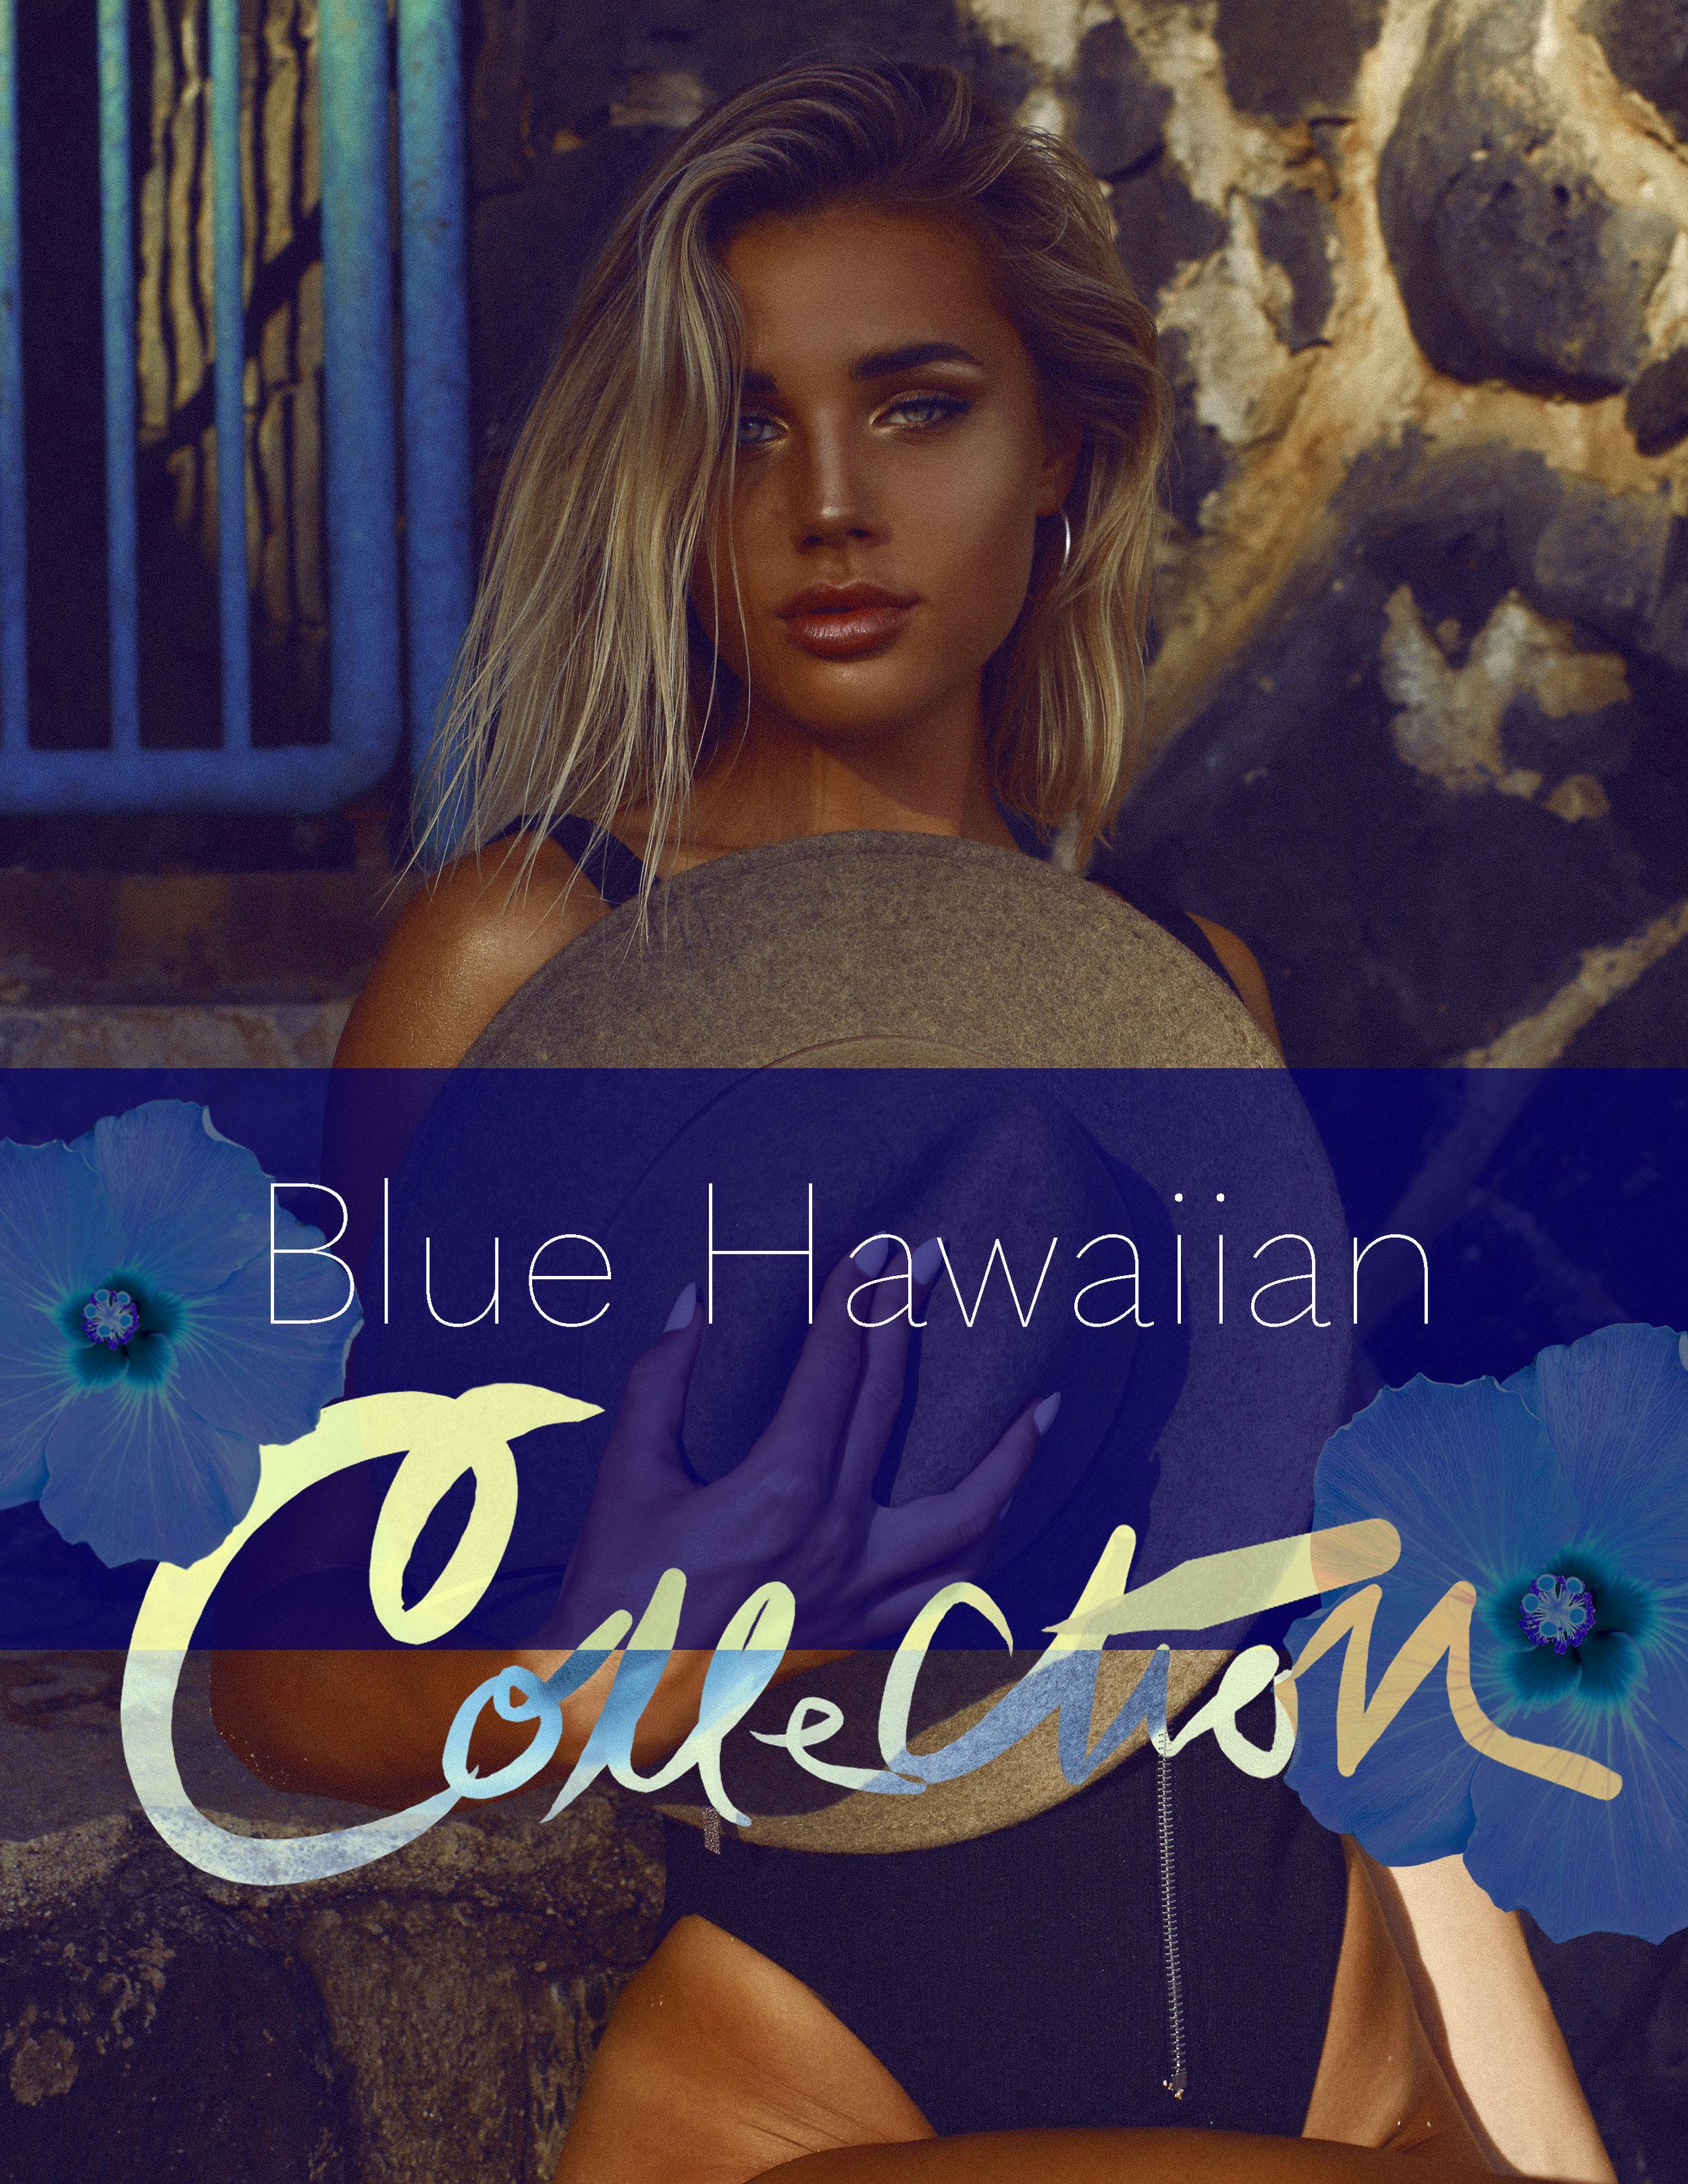 Blue Hawaiian Collection Photoshop Actions - SHOP Photographer Alyssa Risley @alyssarisley